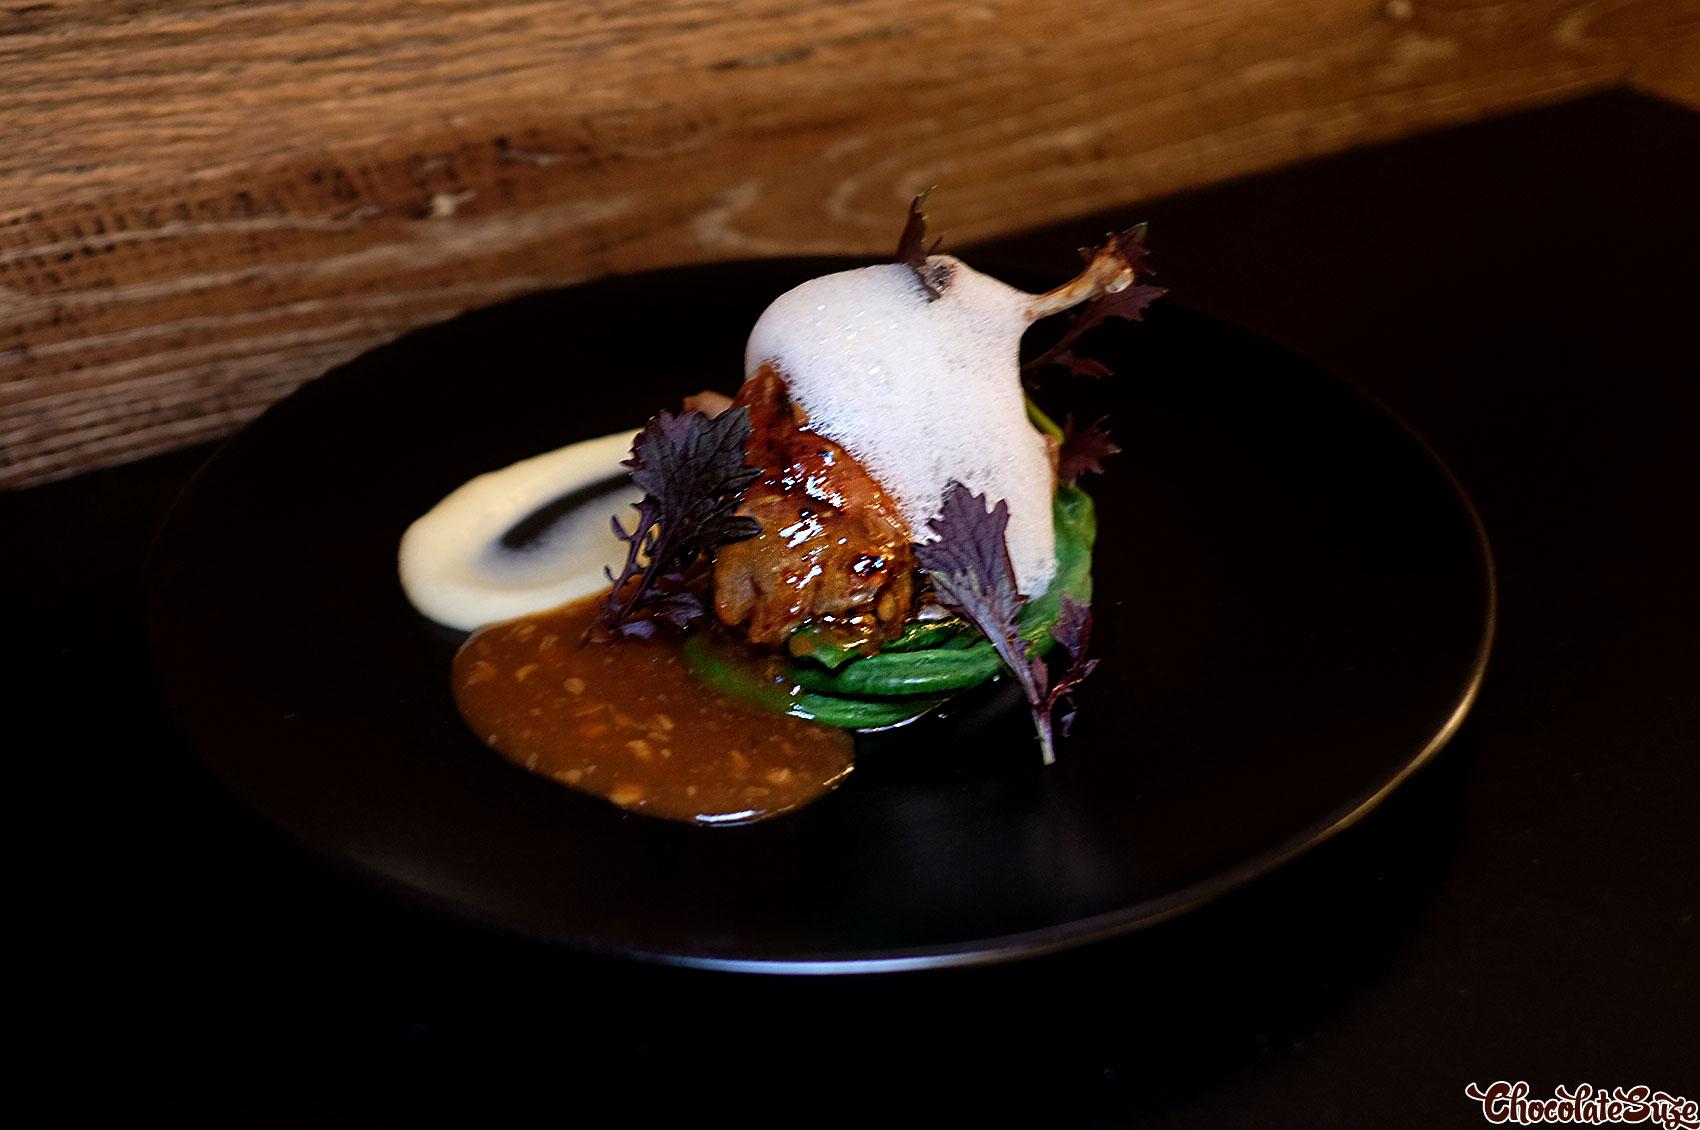 Roasted quail at Eiju Fusion Japanese Dining, Pyrmont